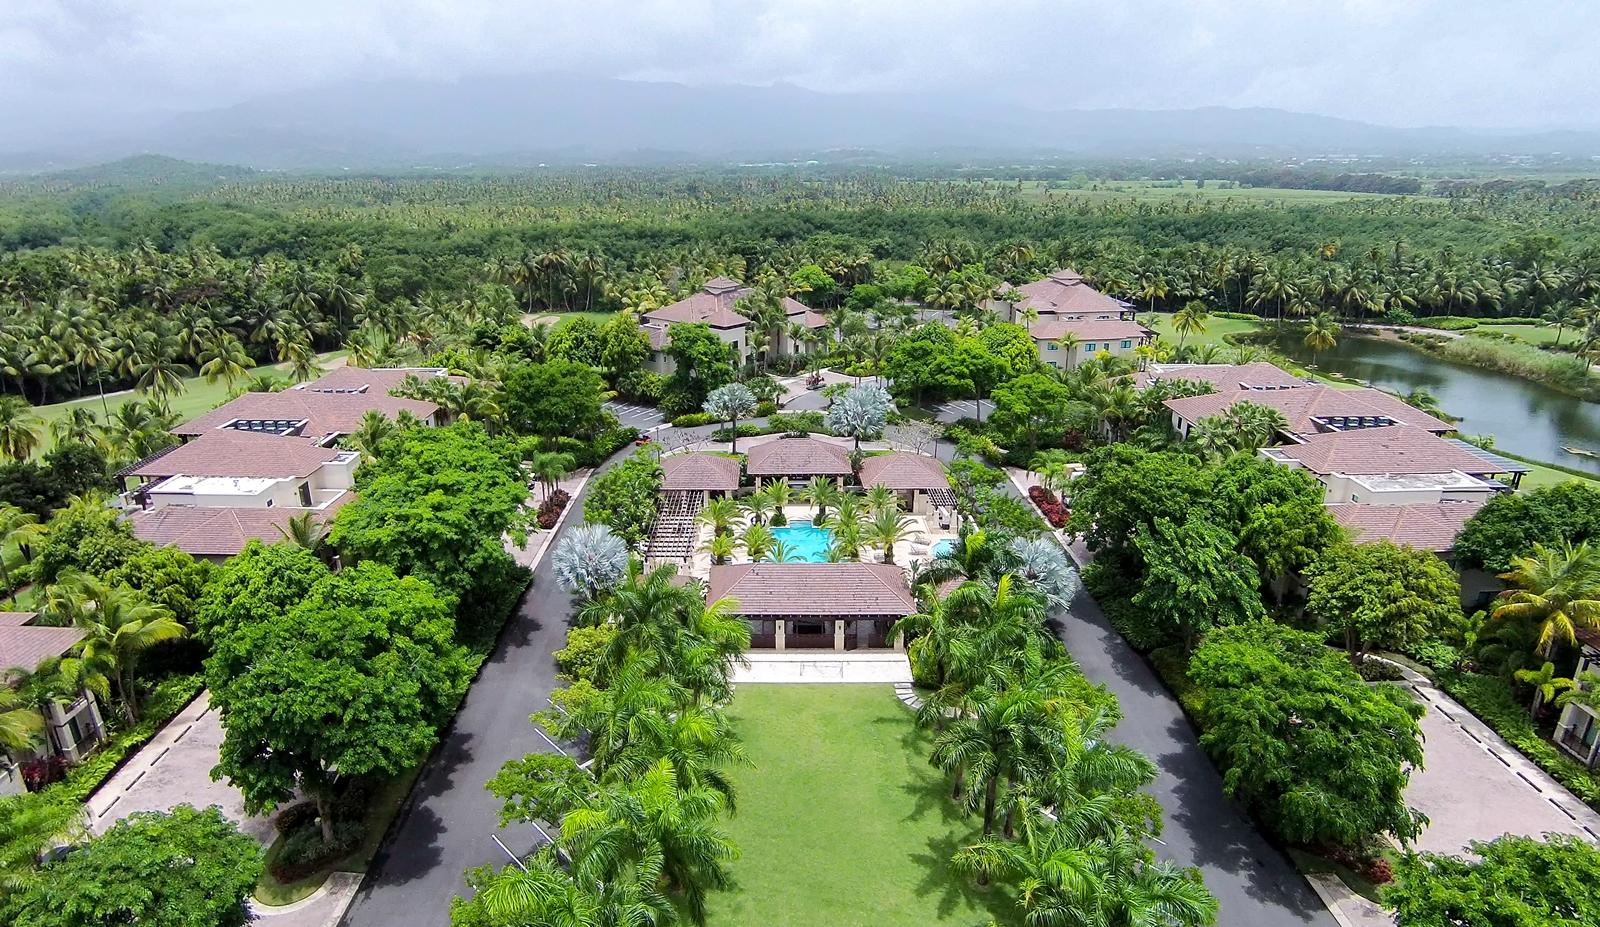 Additional photo for property listing at Lakefront with Golf Views Villa State Rd. 187, Km. 4.2 Las Verandas Apt 1206 Rio Grande, Puerto Rico 00745 Puerto Rico